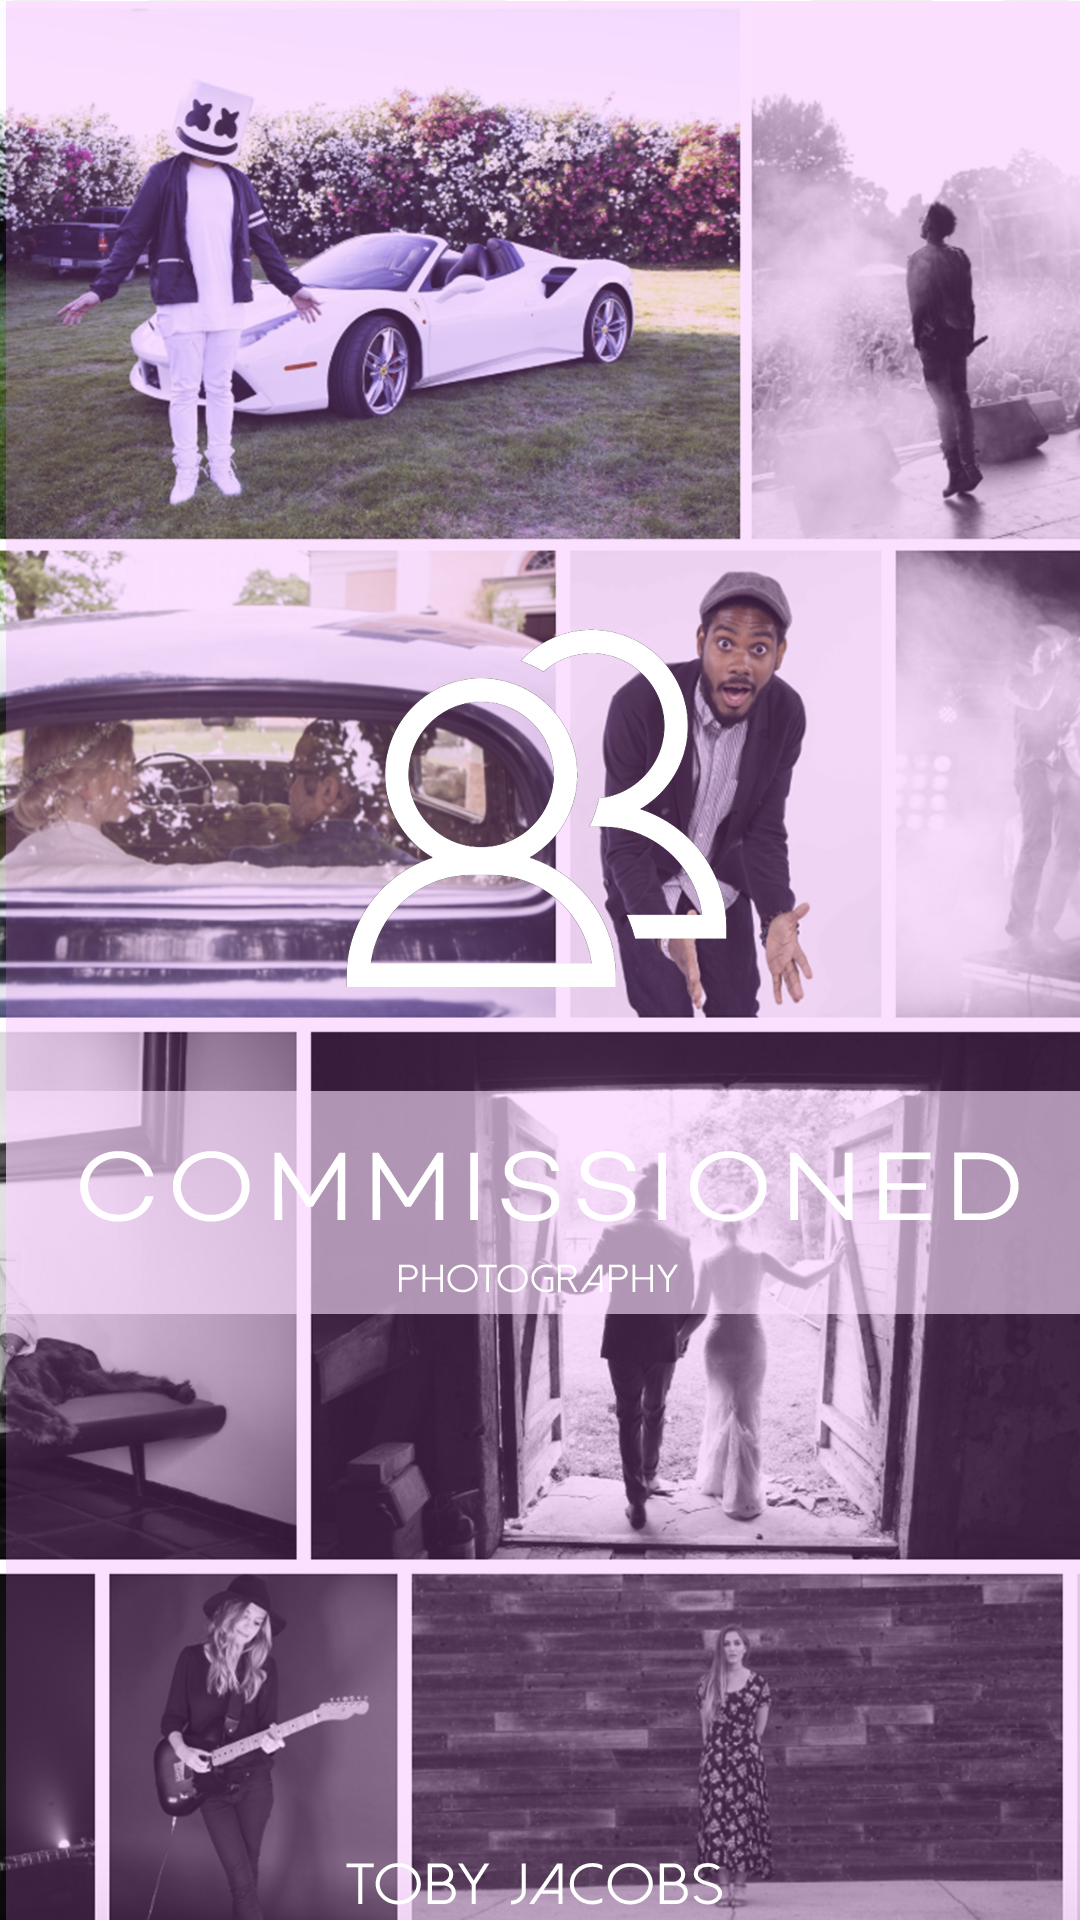 commissionedscover1.jpg